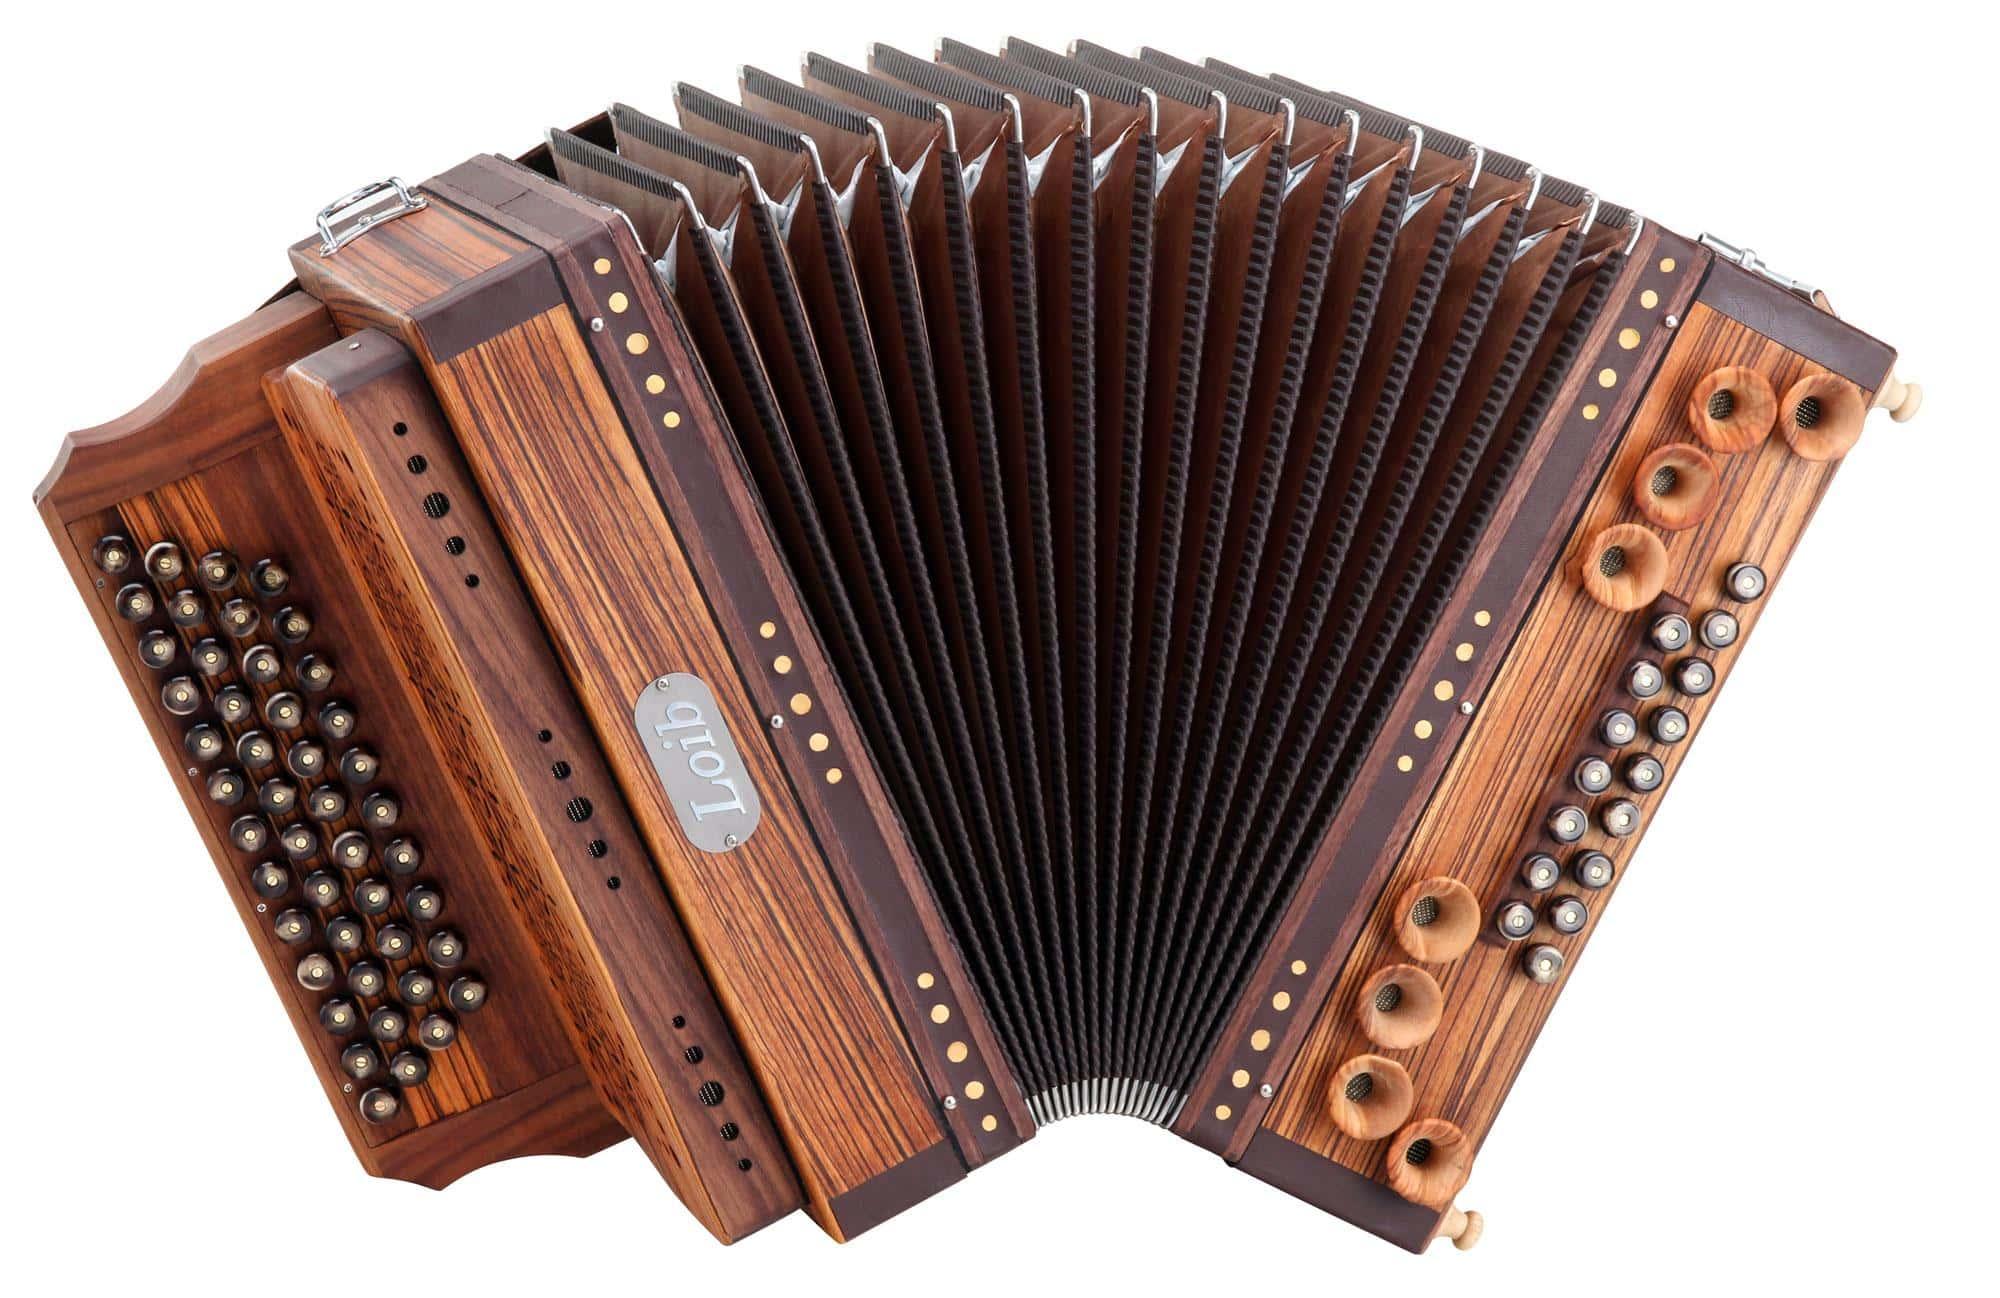 Loib Harmonika IVD Zebrano G-C-F-B mit H- und X-Bass, Holzverdeck